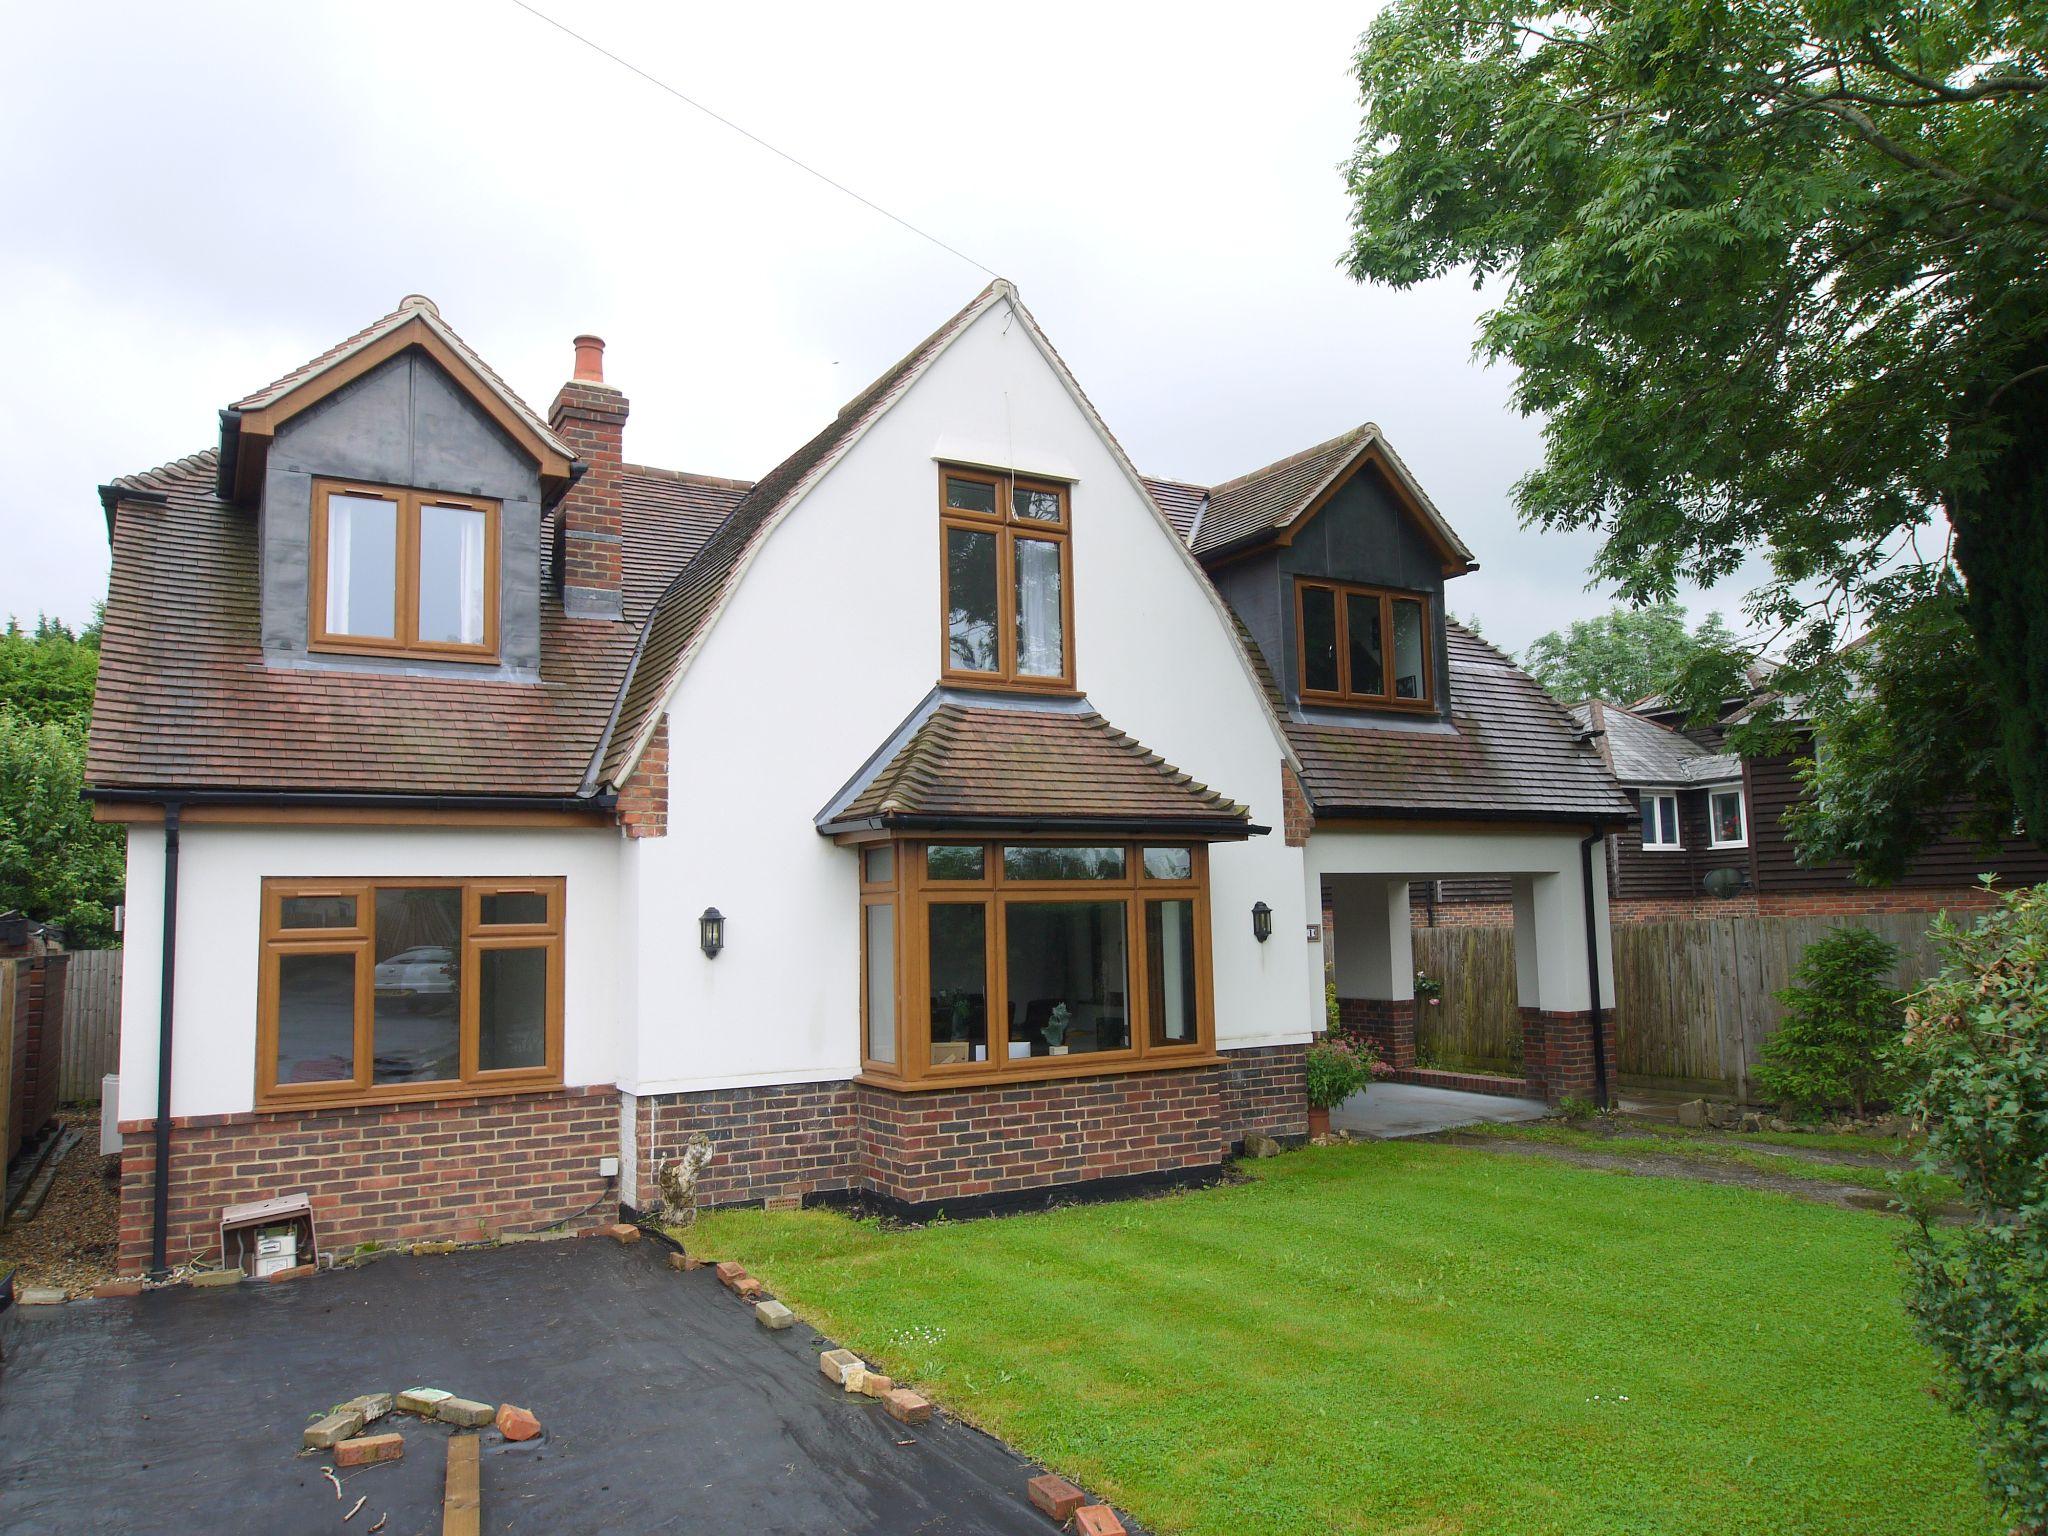 5 bedroom detached house Sold in Sevenoaks - Photograph 1